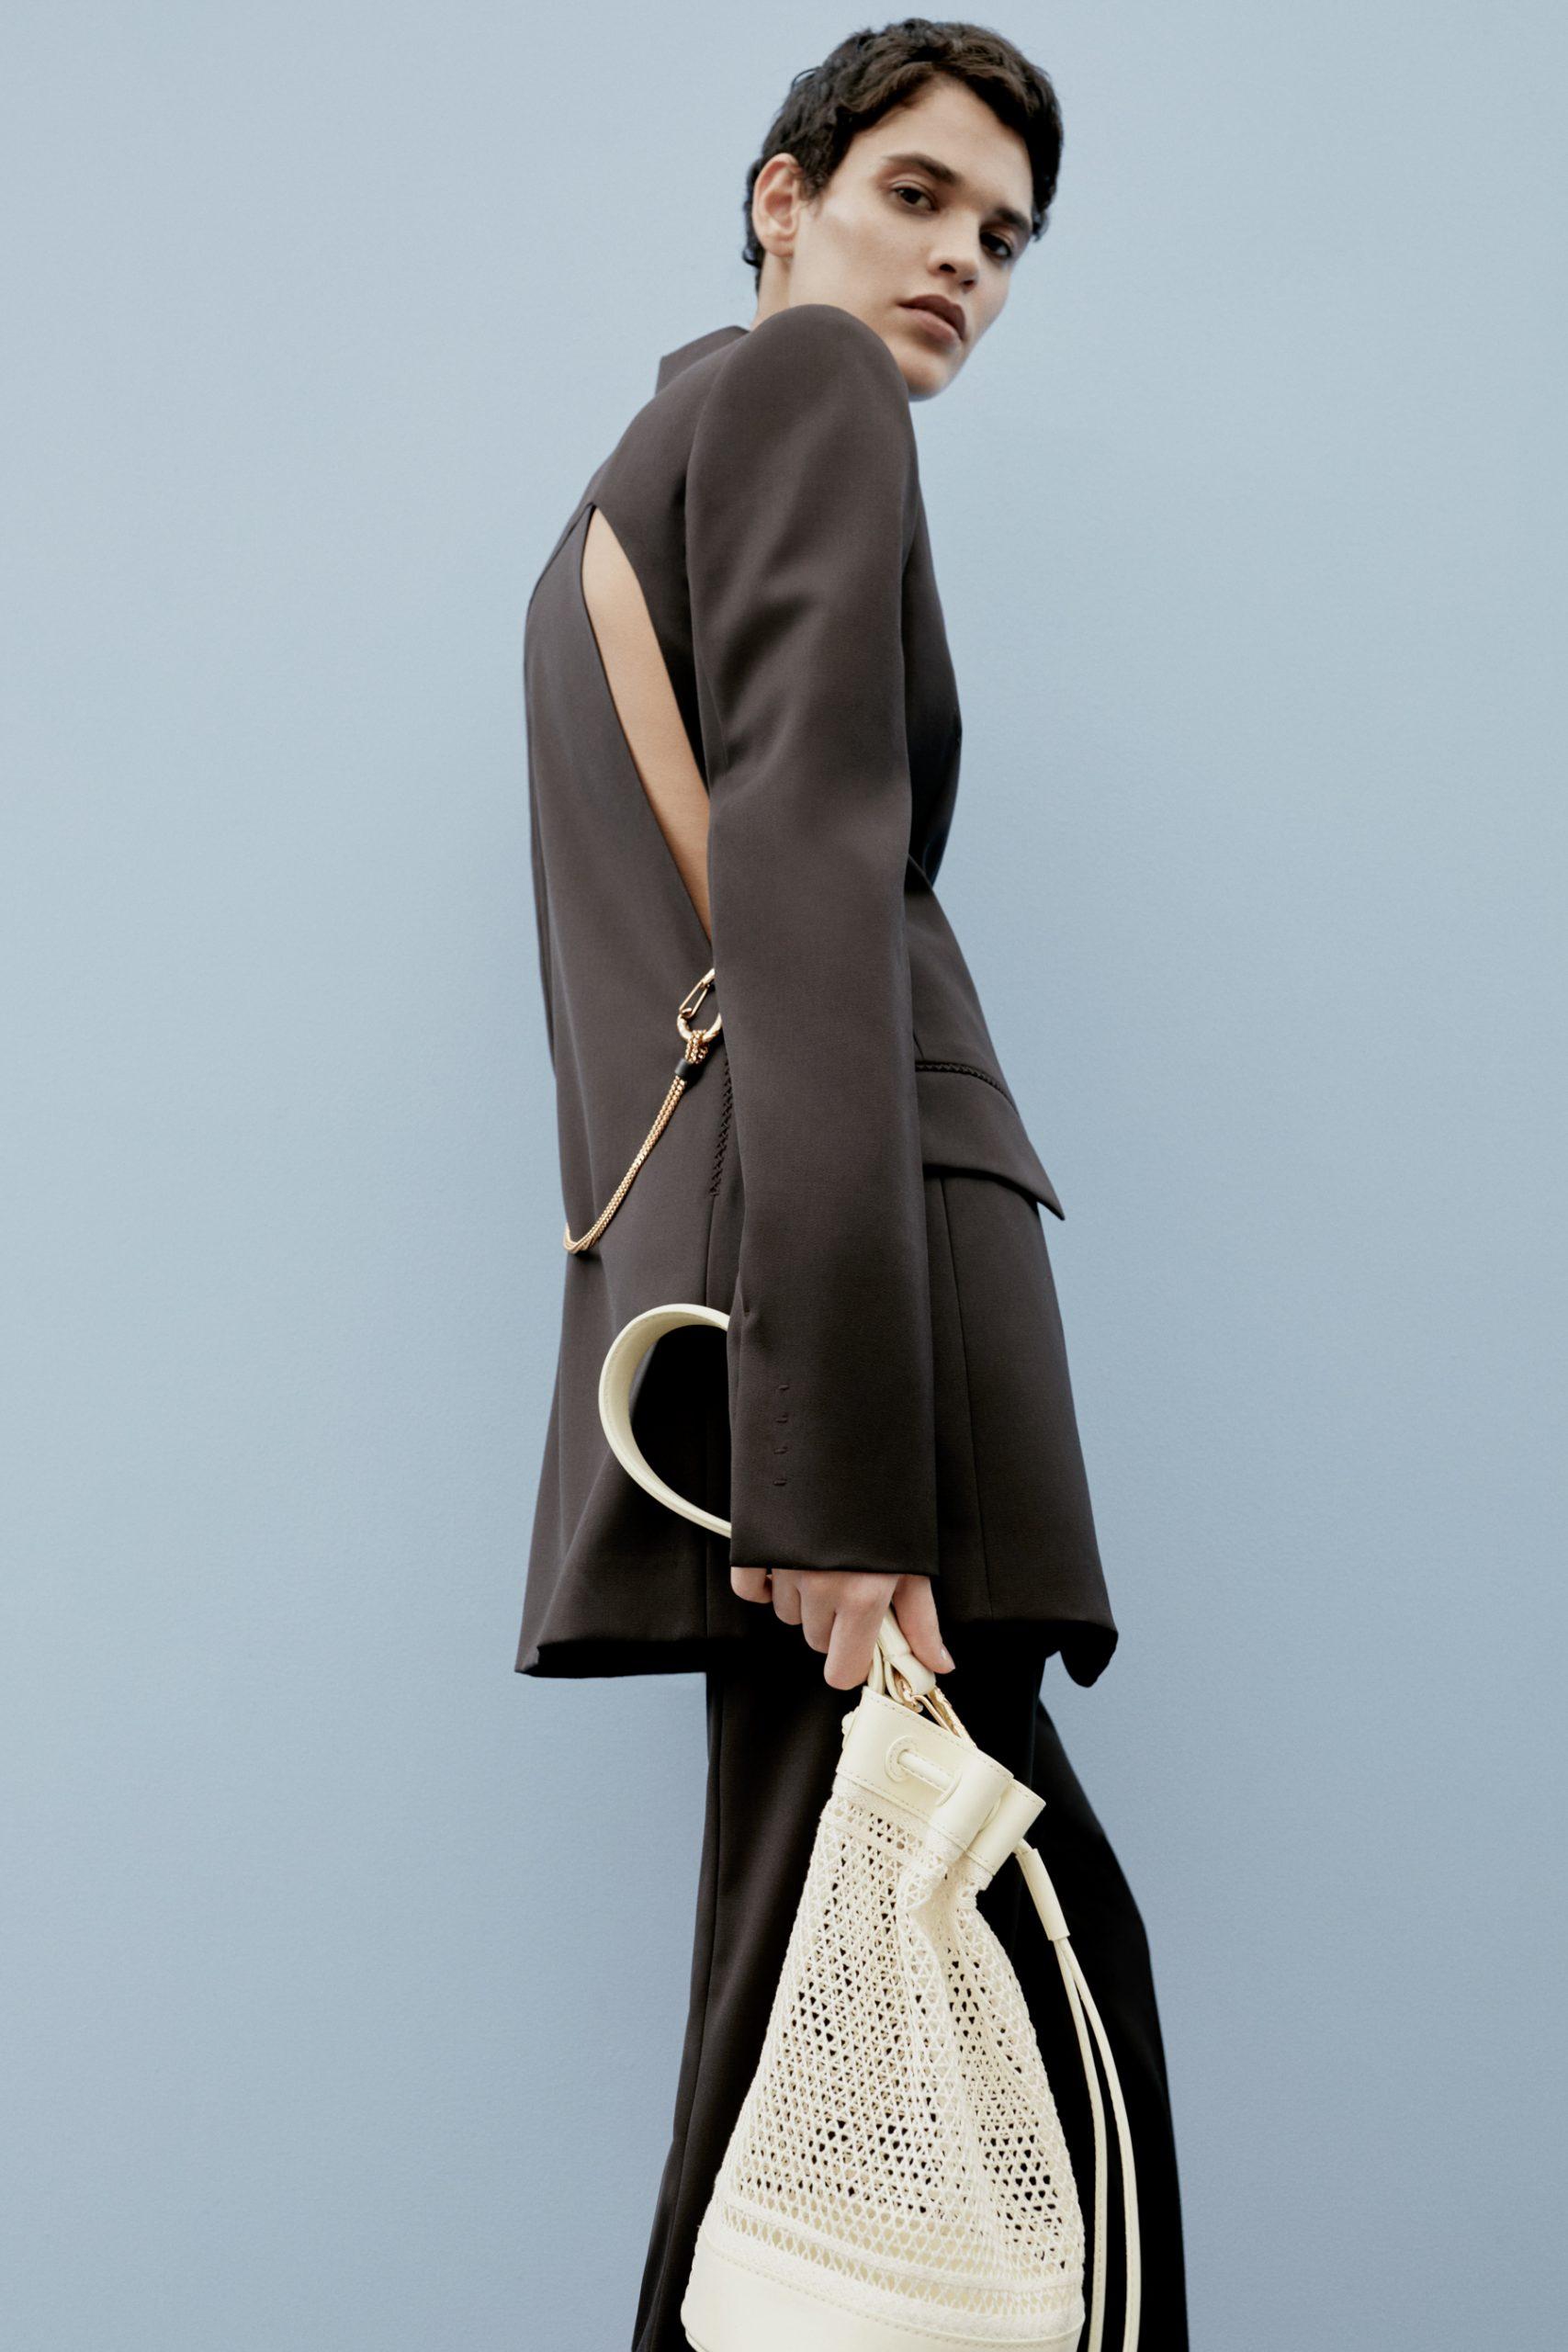 Gabriele Colangelo Spring 2021 Fashion Show